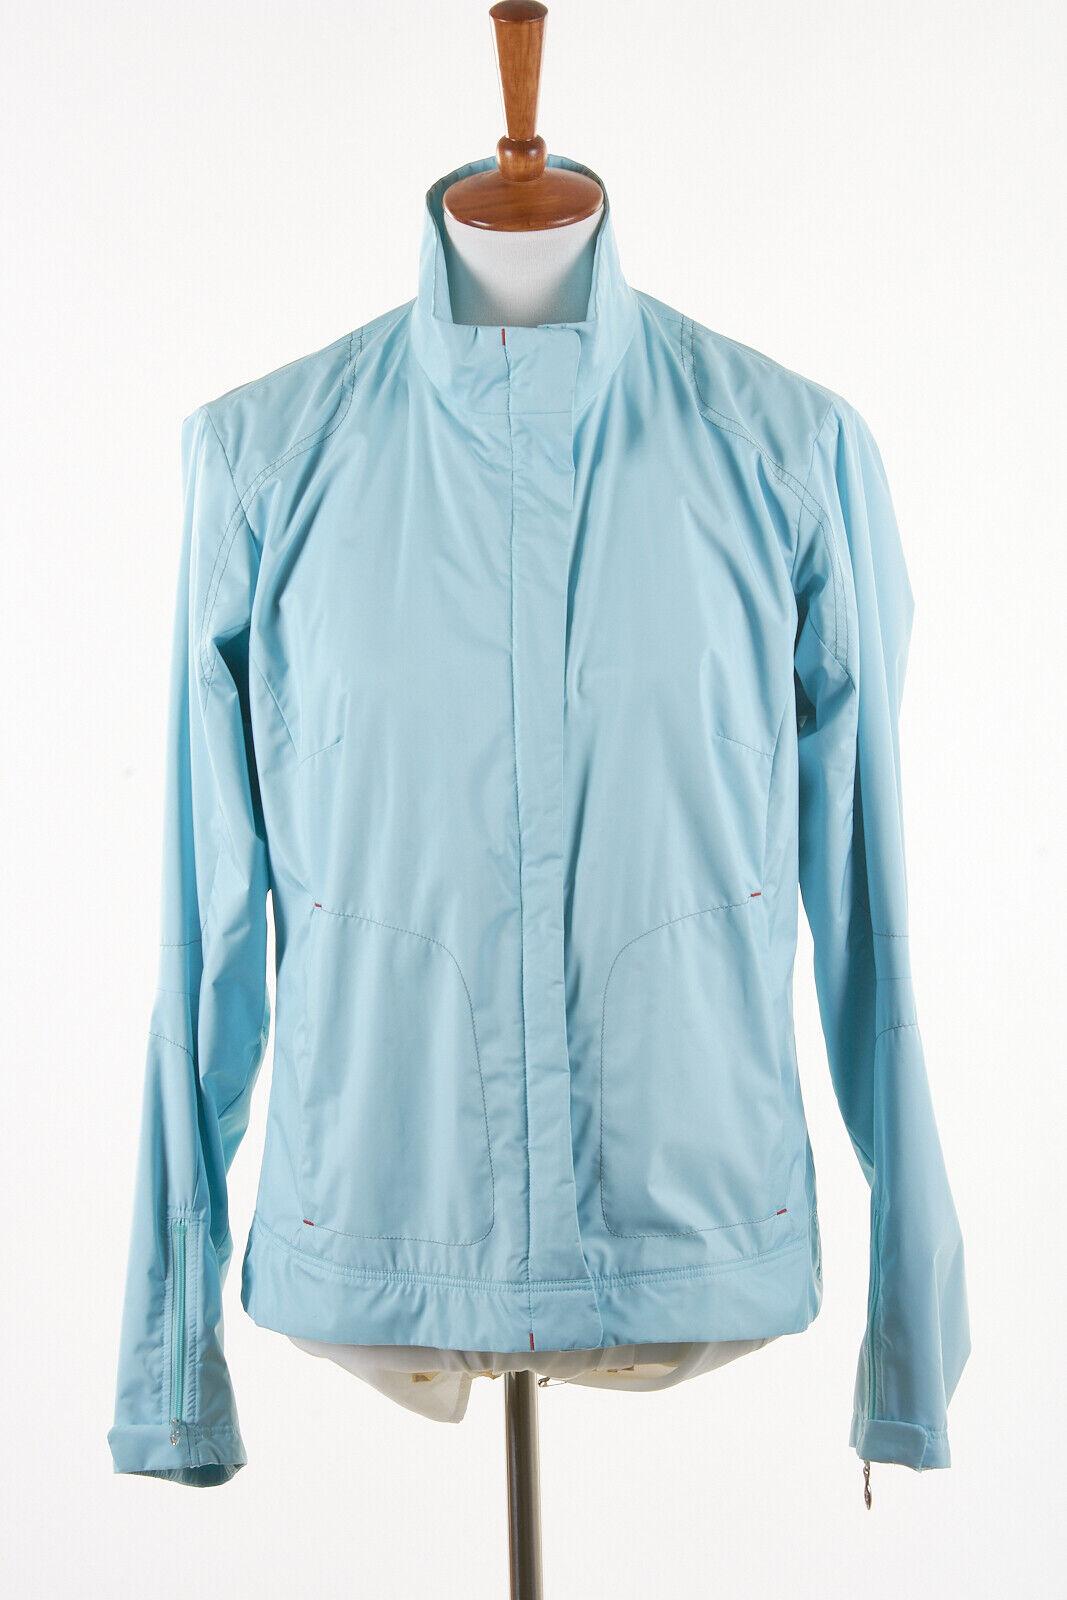 Womens BOGNER Jacket 10 in Sky Aqua Blue Polyester Full-Zip Windbreaker Shell